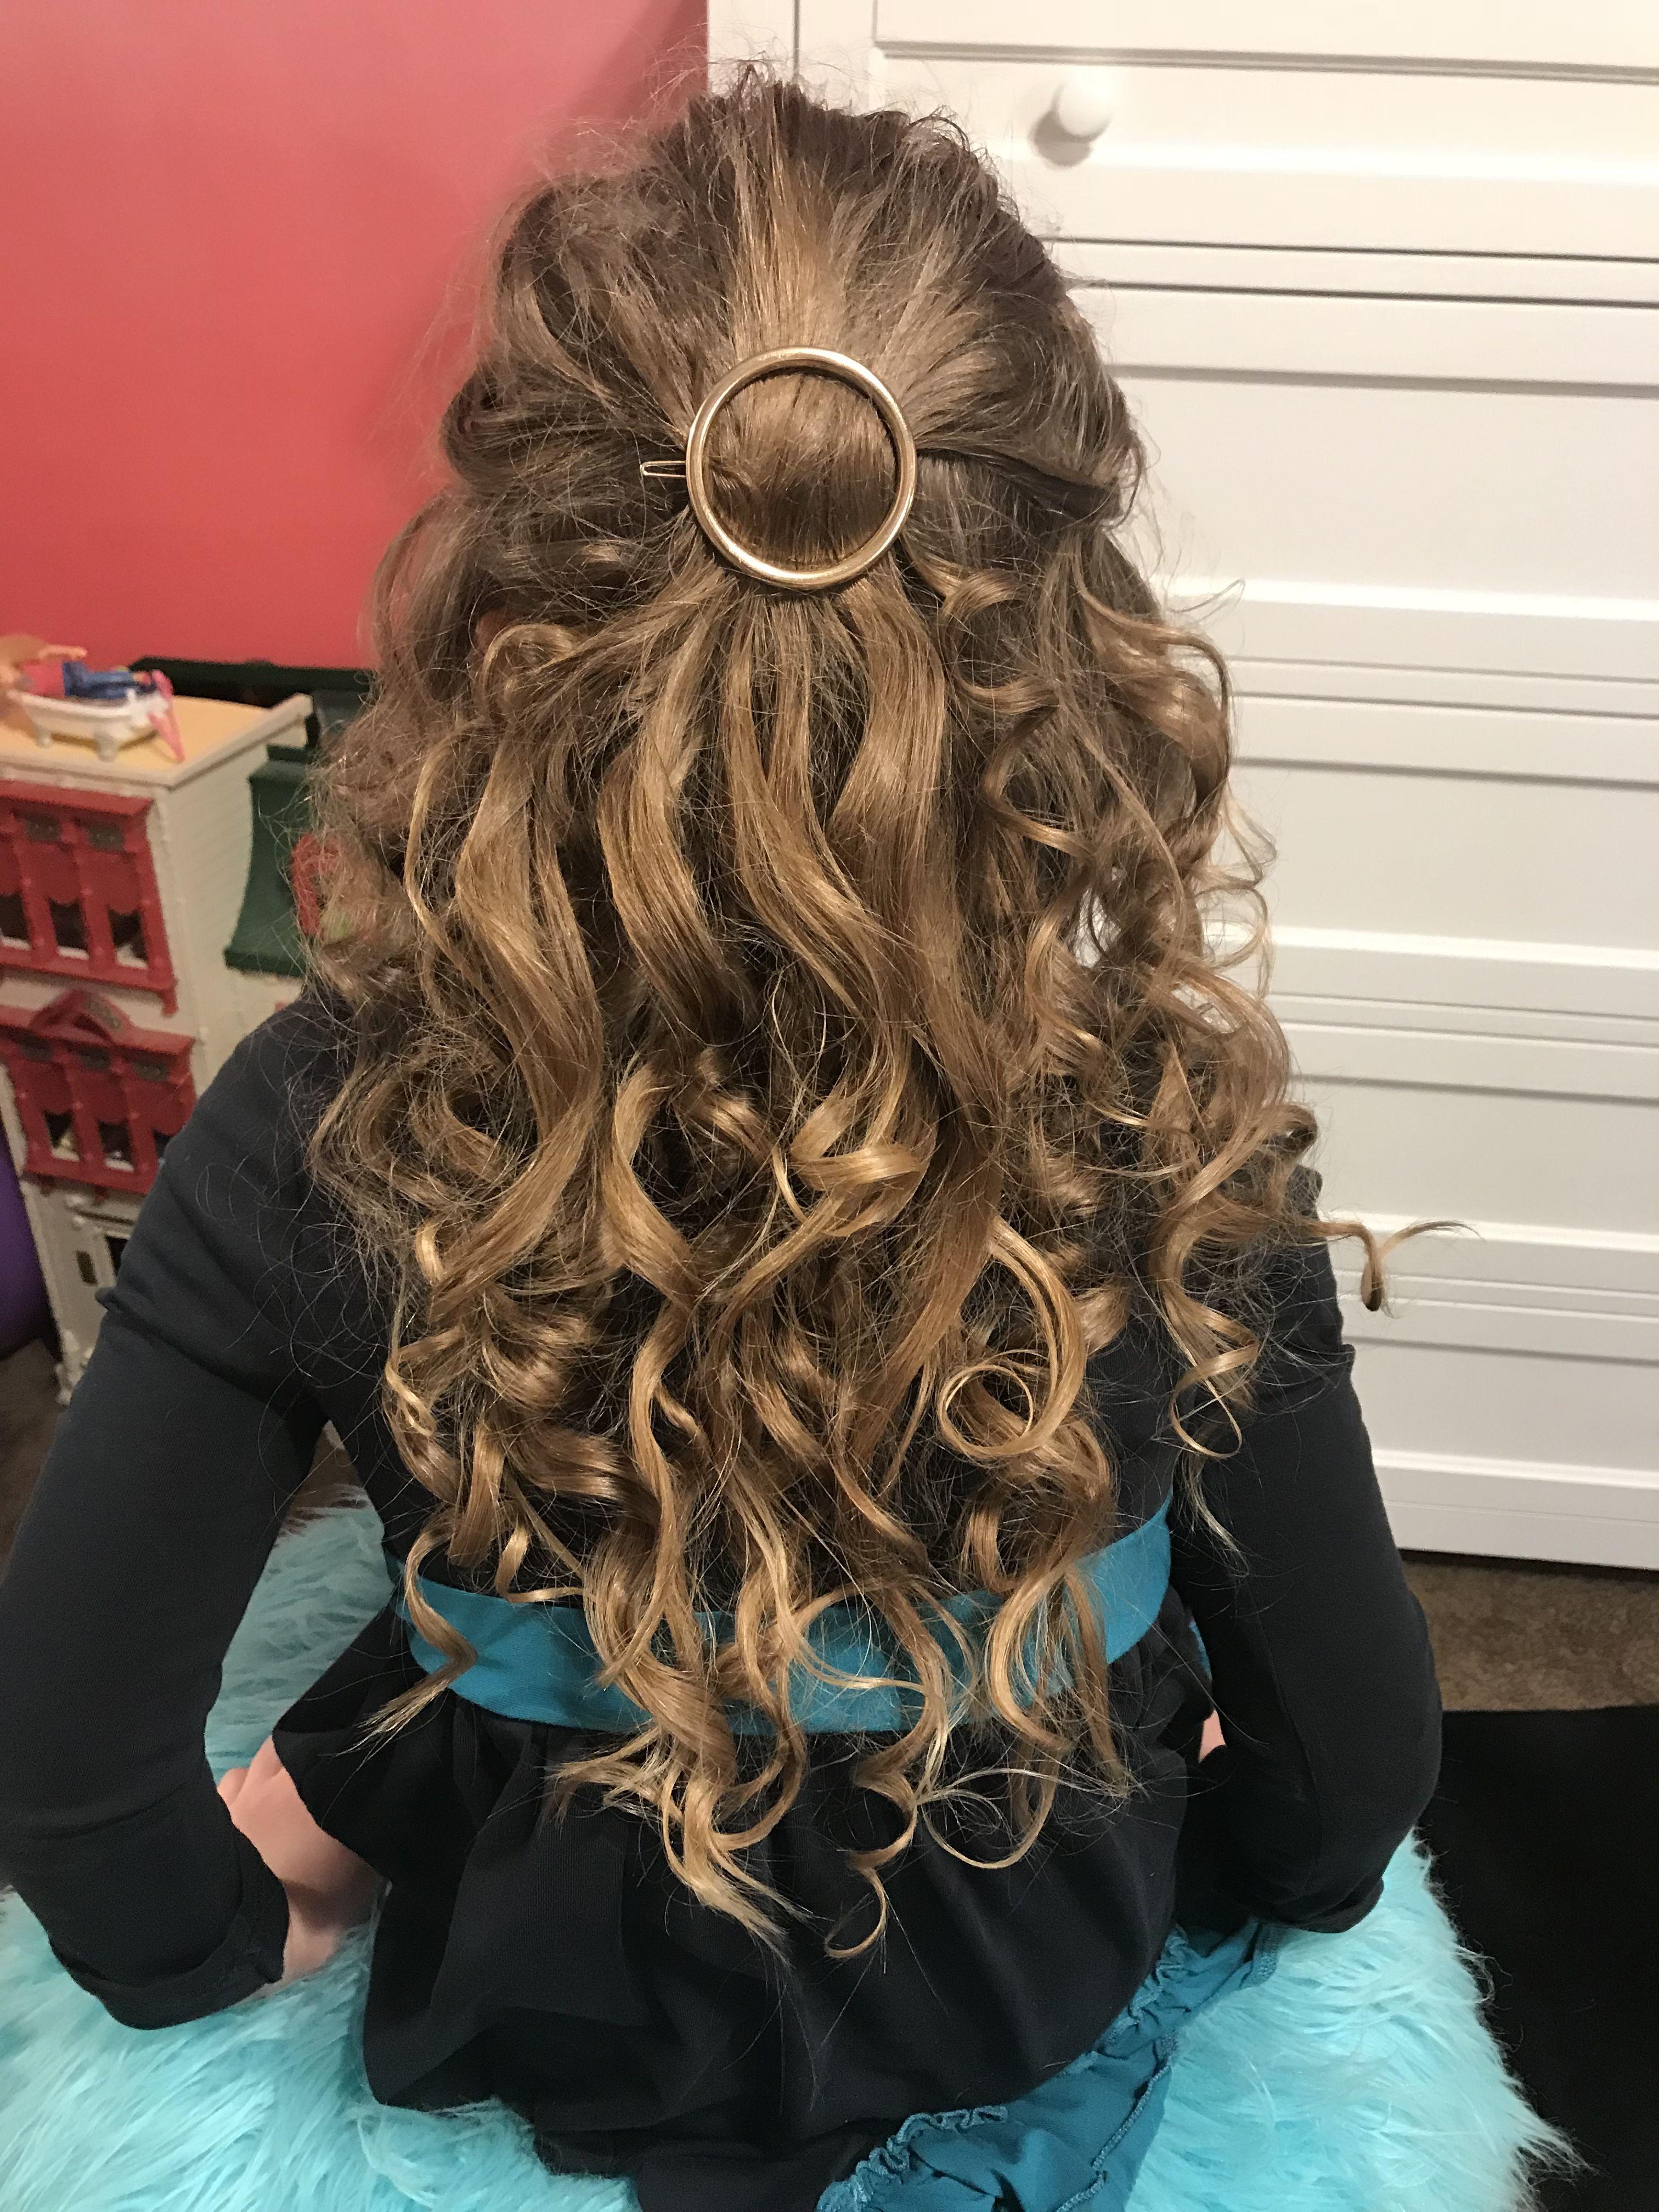 Girls hair hair styles pinterest girl hair and hair style